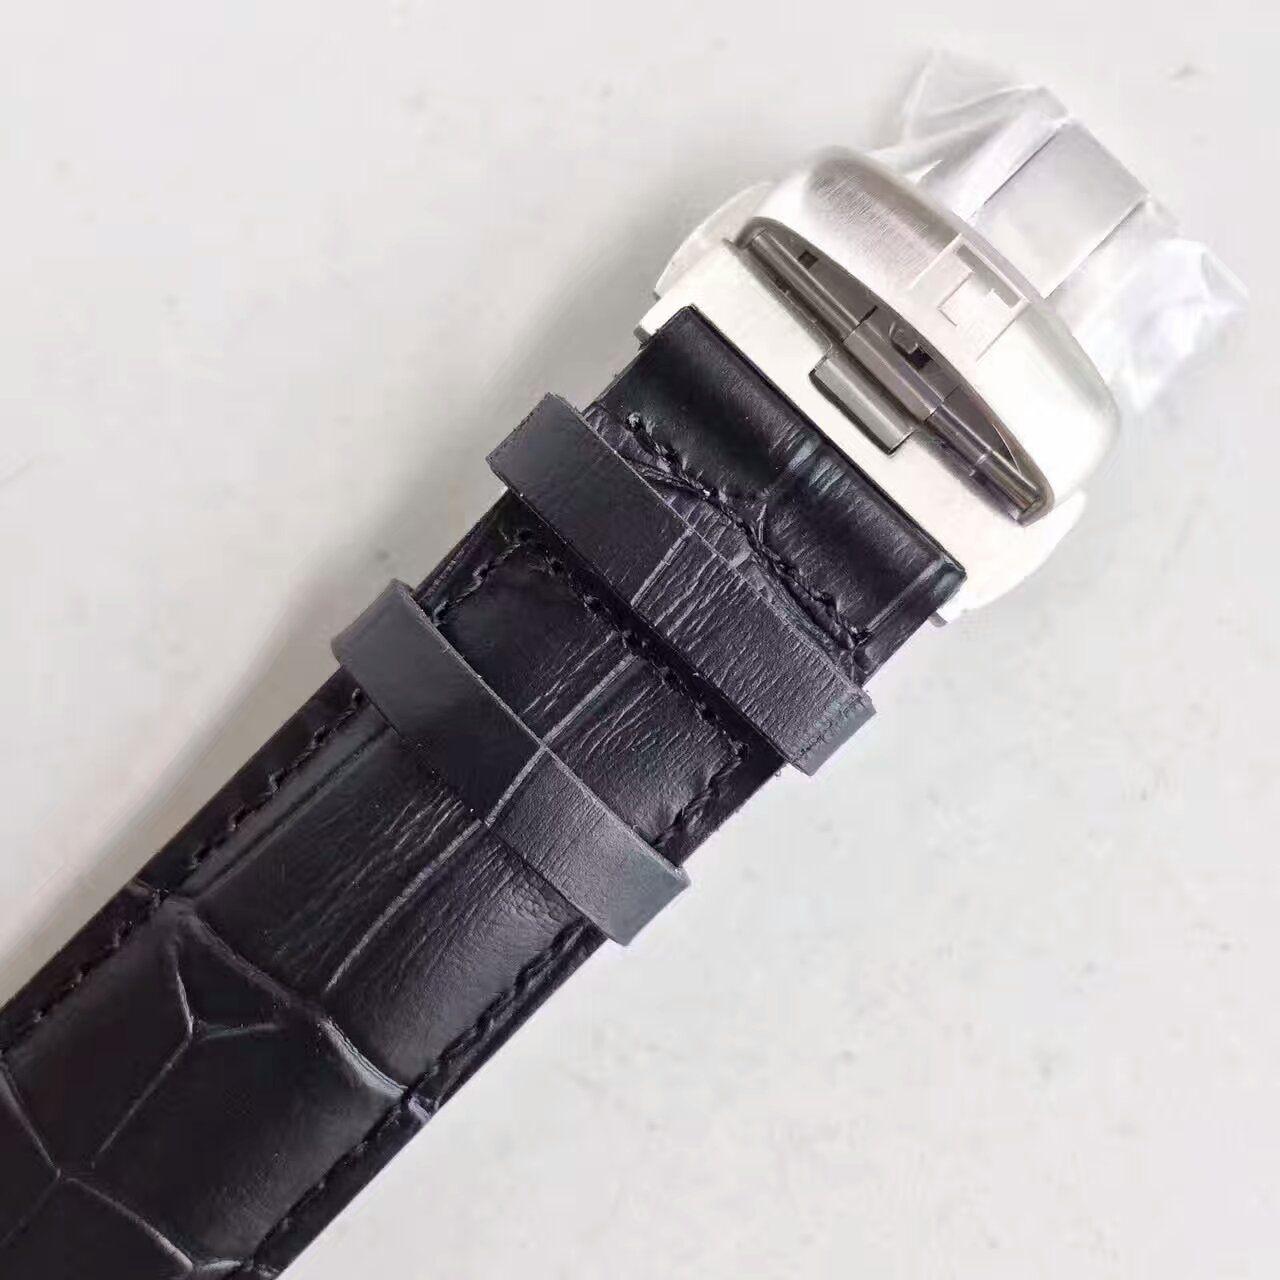 【A8厂出品】天梭T-CLASSIC系列T070.405.16.411.00腕表 / TS01